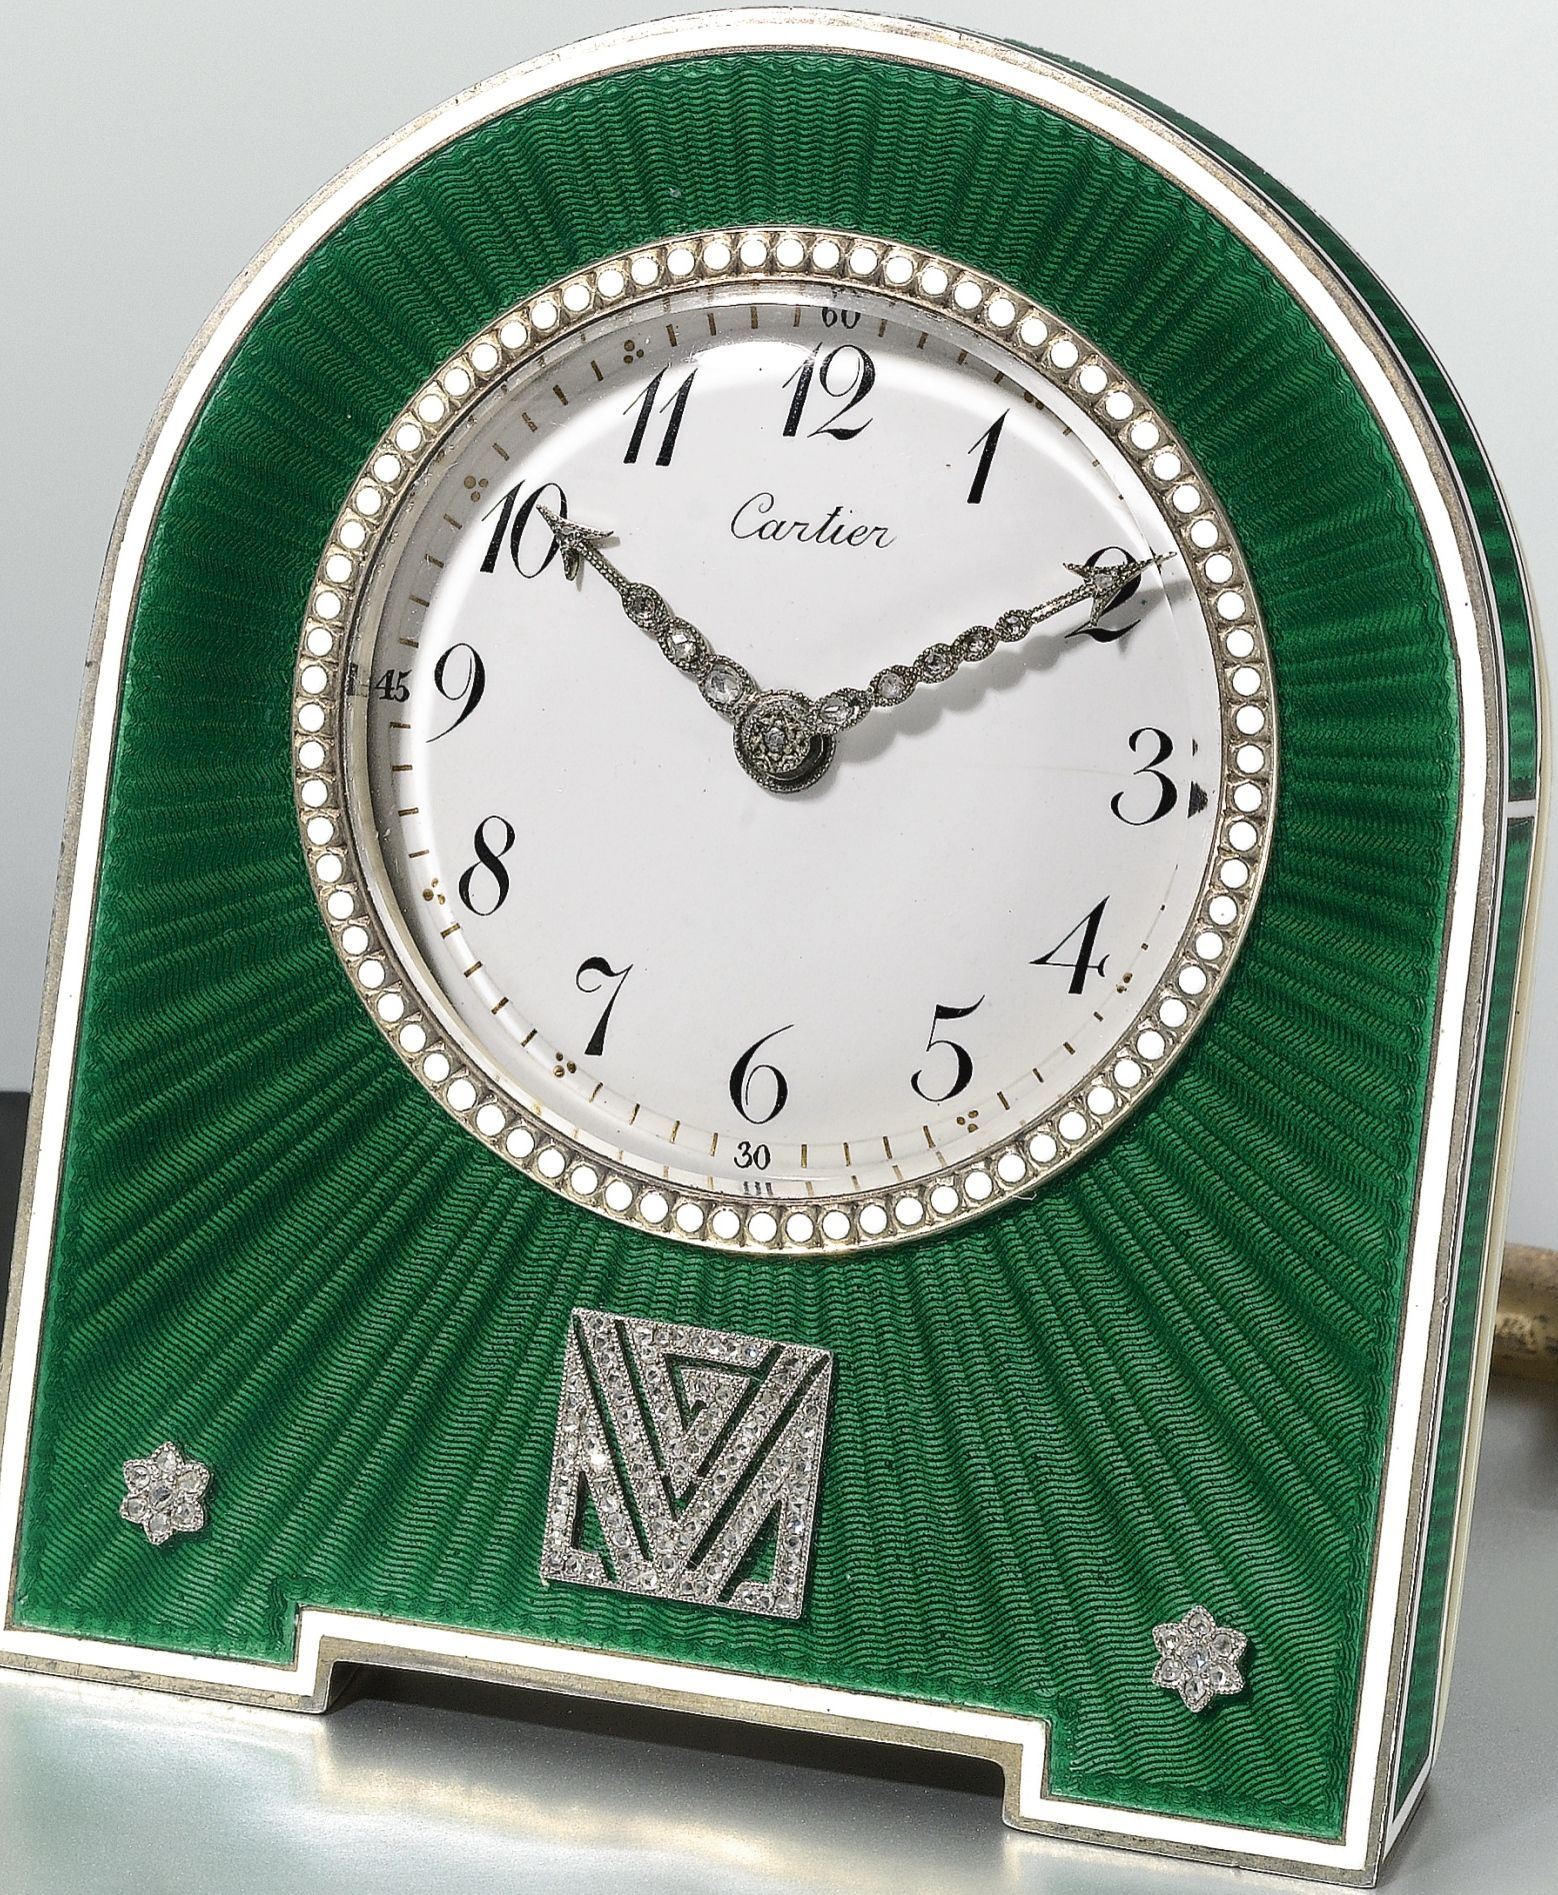 Cartier clocks pinterest cartier and clocks cartier amipublicfo Images